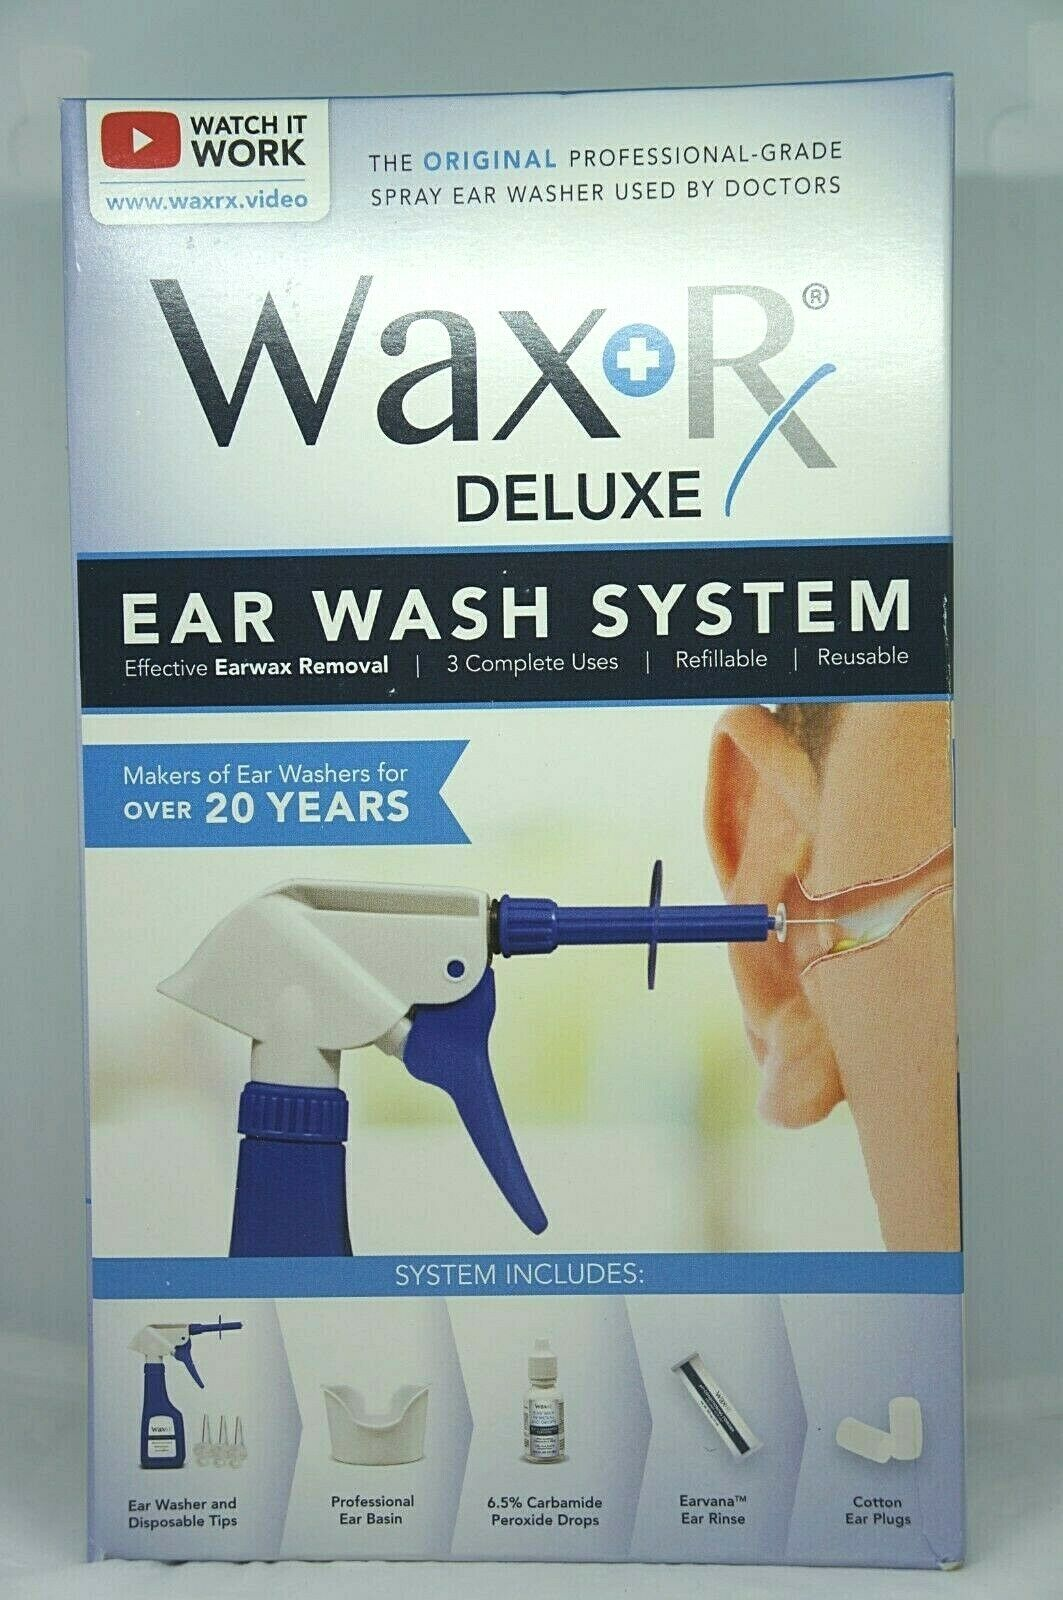 Dr. Easy Wax Rx Deluxe Ear Wash System - Effective Ear Wax R